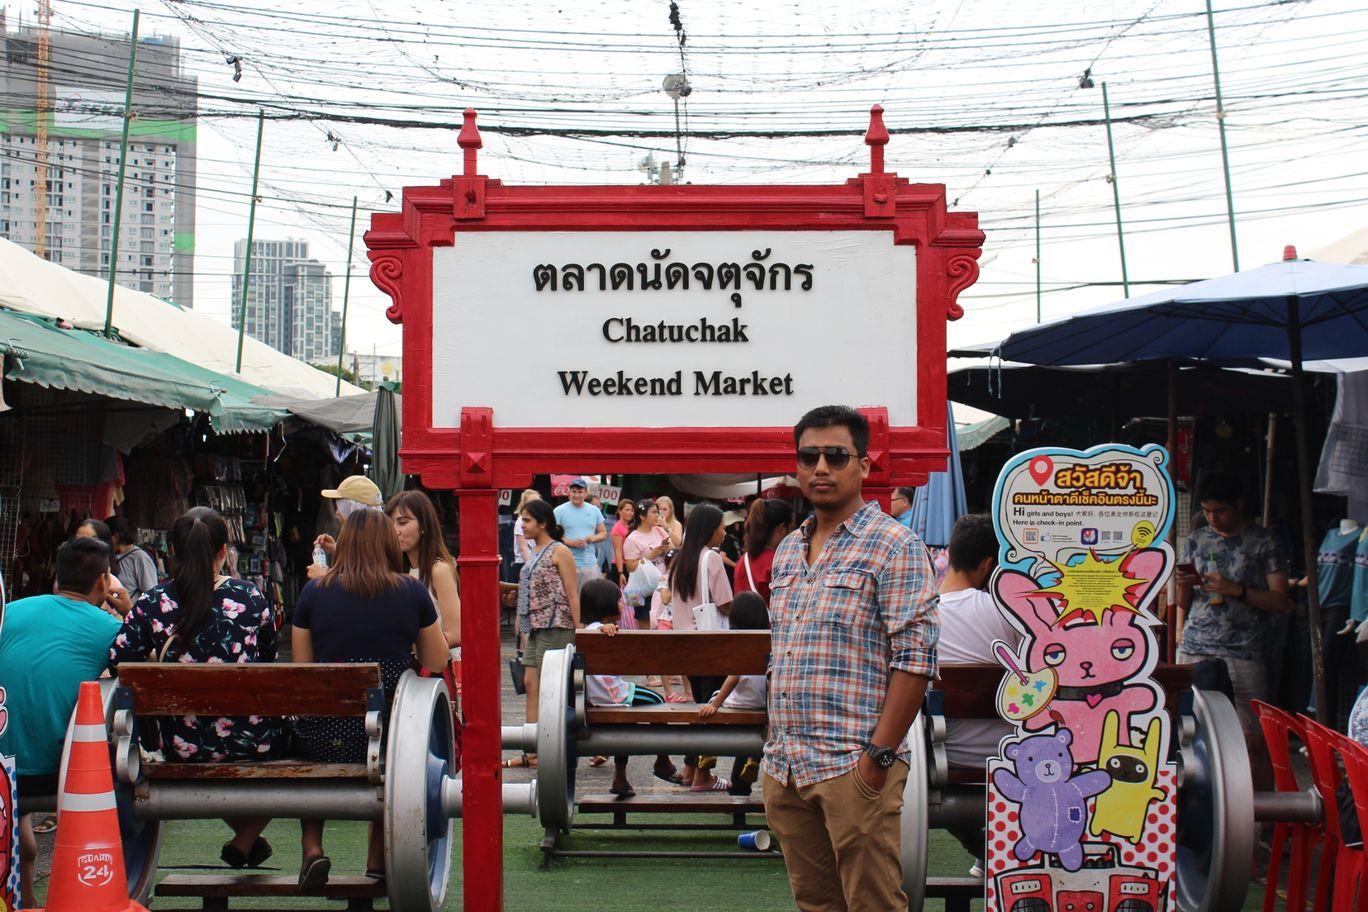 Photo of Chatuchak Weekend Market; Bangkok By NIRUPAM BORGOHAIN